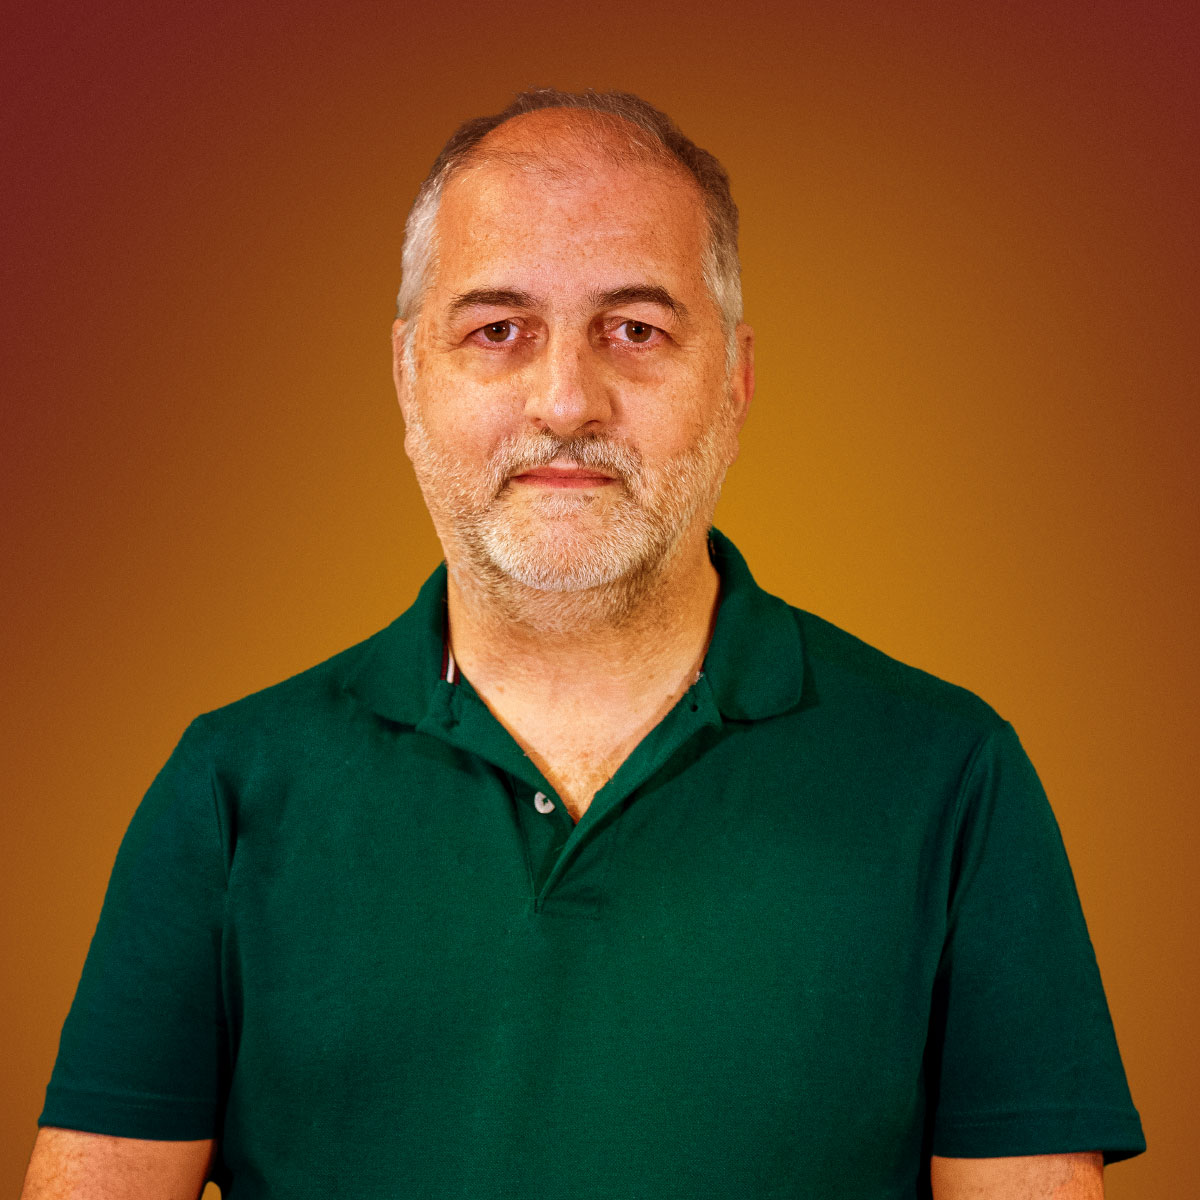 Carlos Macedo | Amadora | PAN | Autárquicas 2021